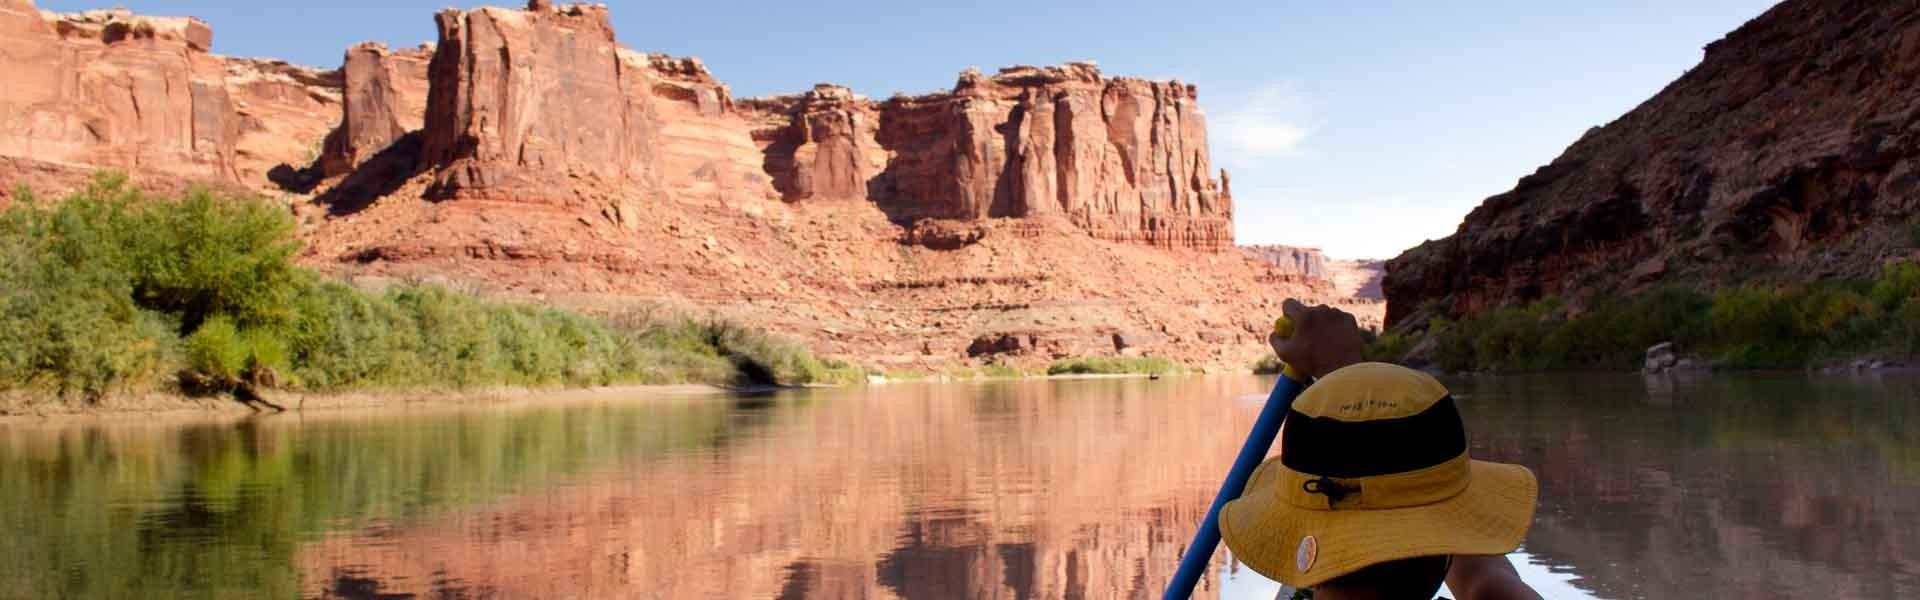 SteamboatMountainSchool-Highschool-Colorado-canoerowing-Main-BAnner-2019